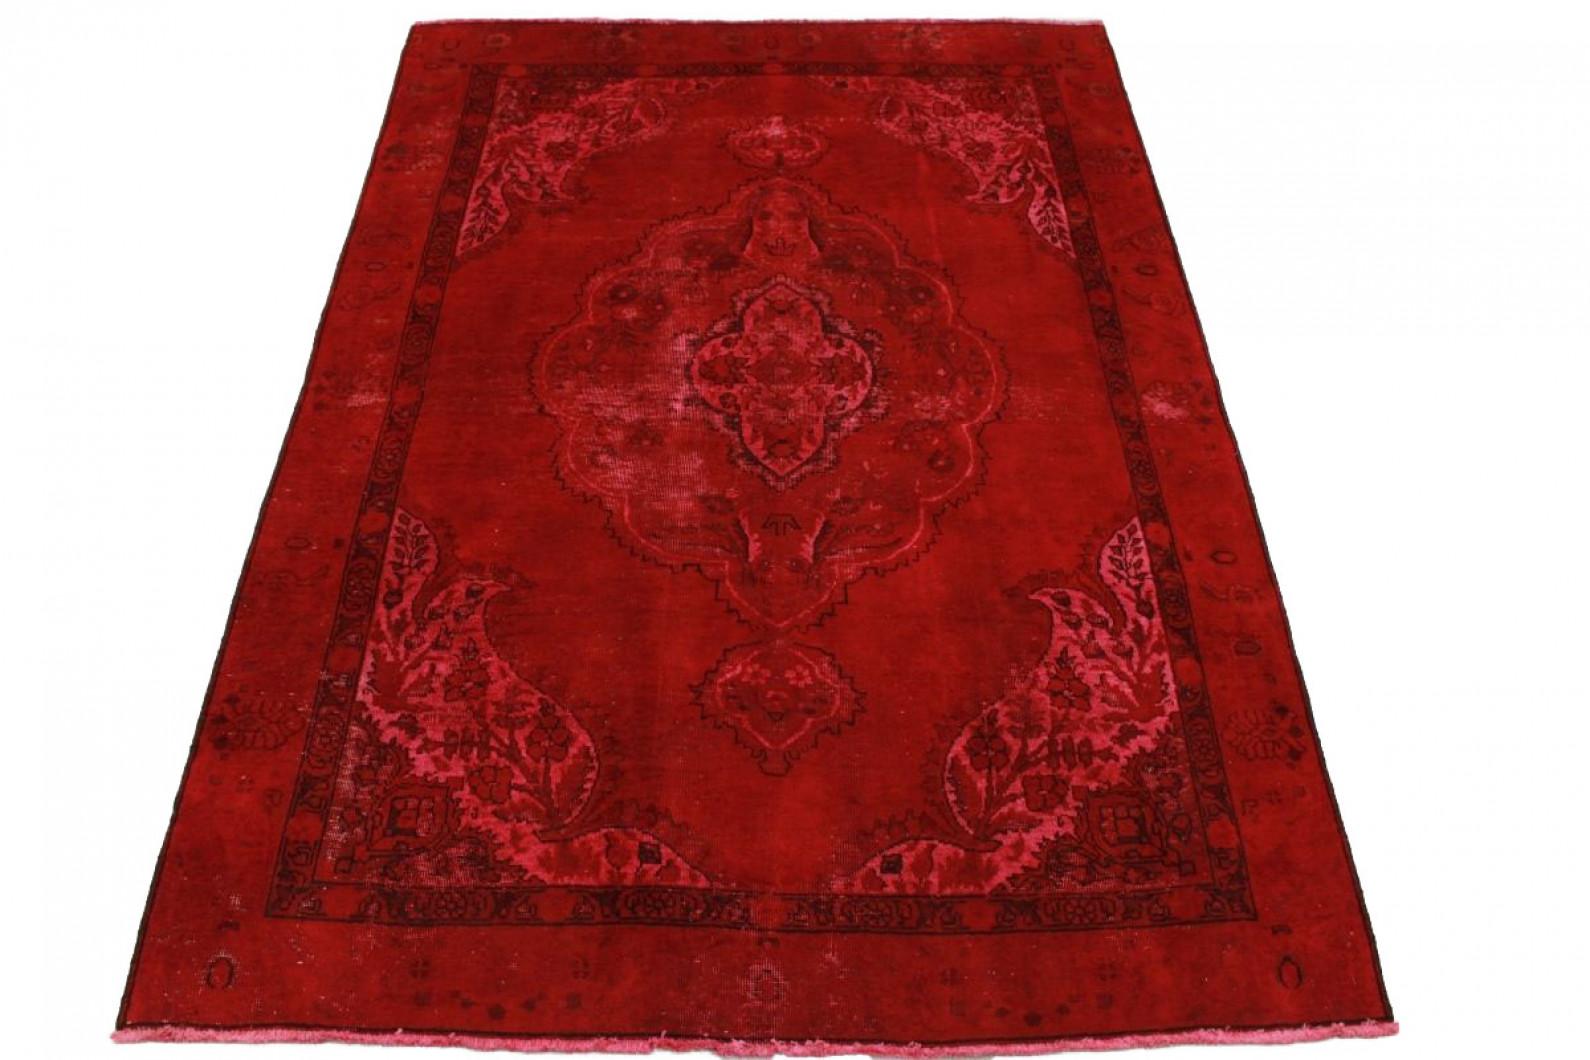 Vintage Teppich Rot in 280x190cm (1 / 7)